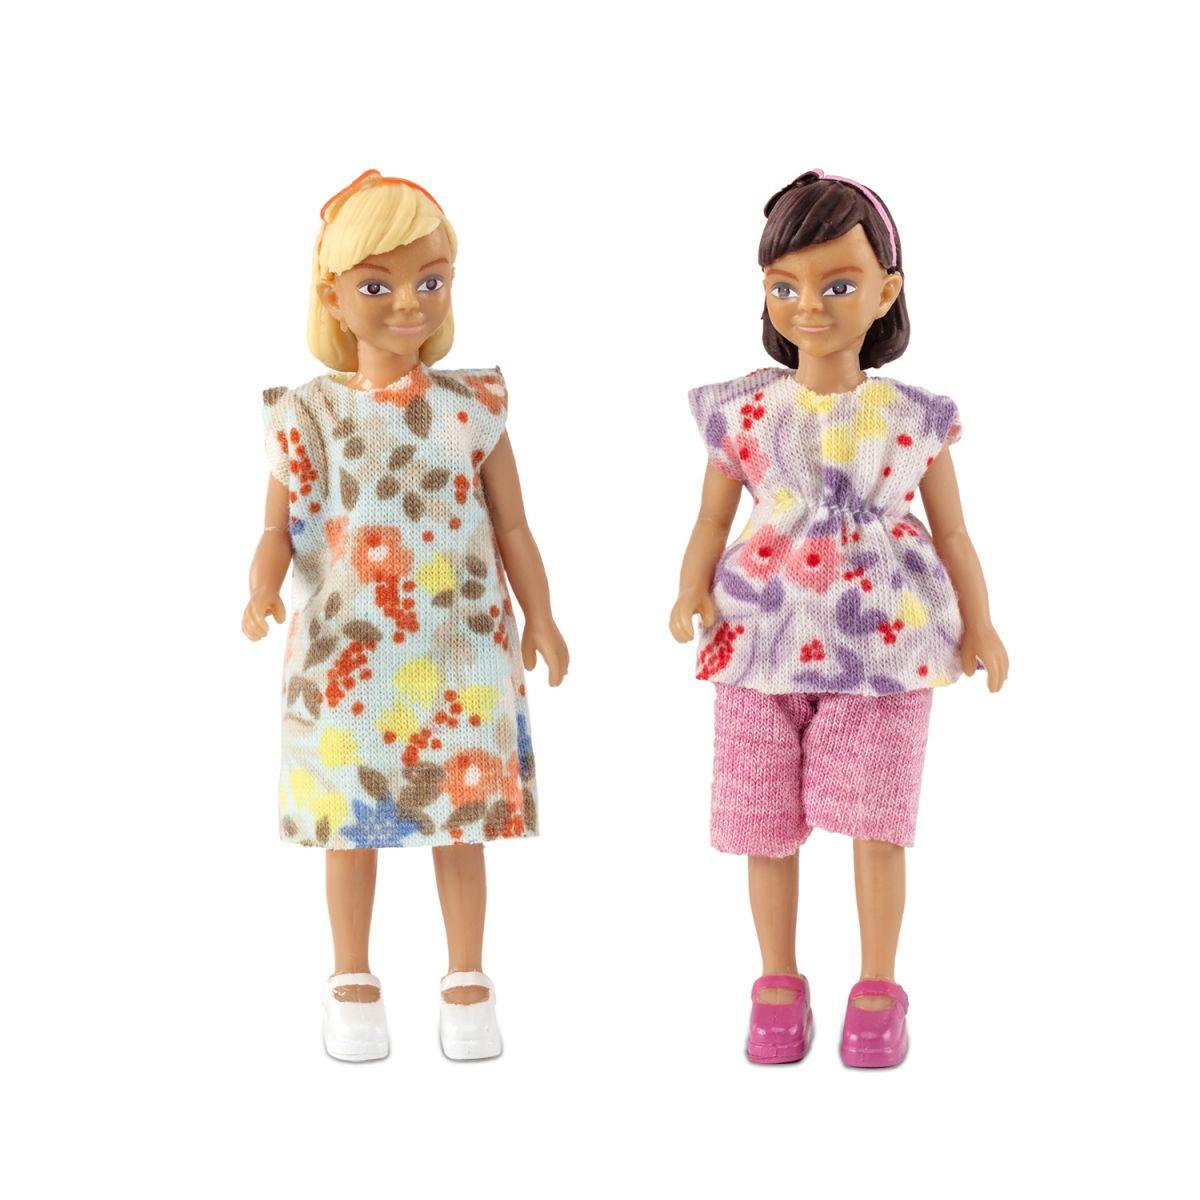 Uitbreiding lundby poppenhuis collectie bentoys for Poppenhuis meisje